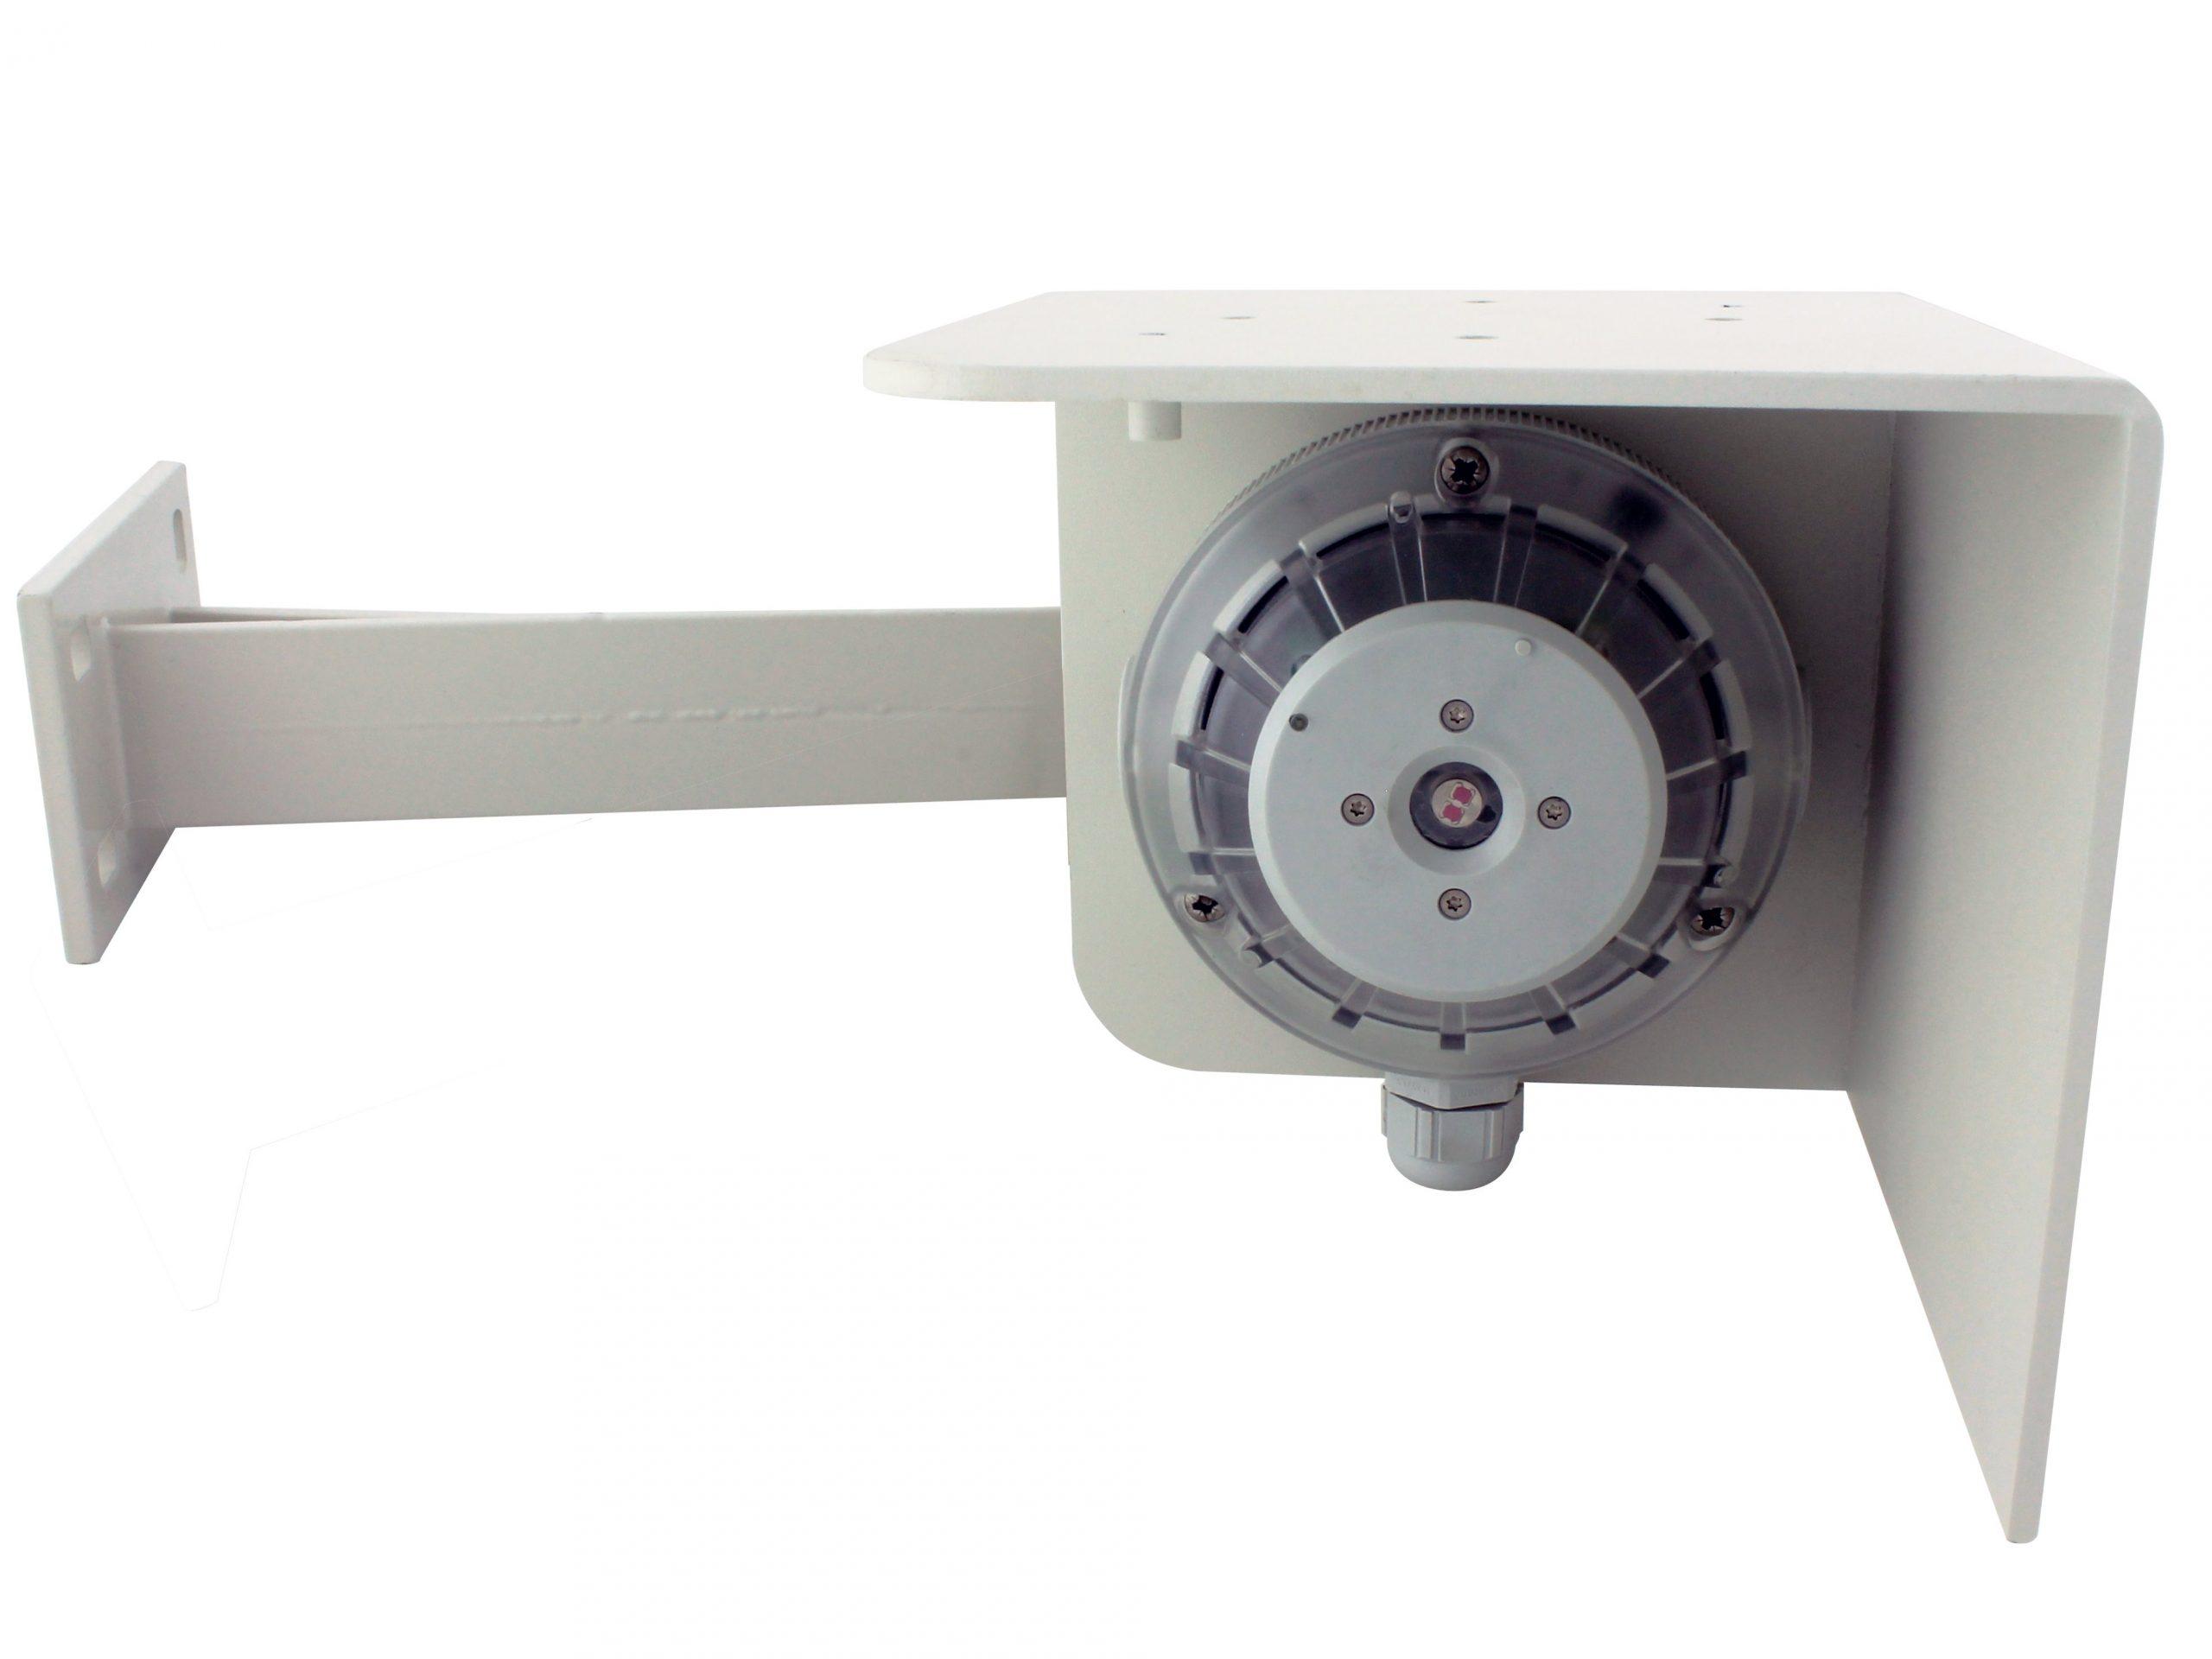 Autrosystems Vlamdetector BG-201 aan gevel Autronica